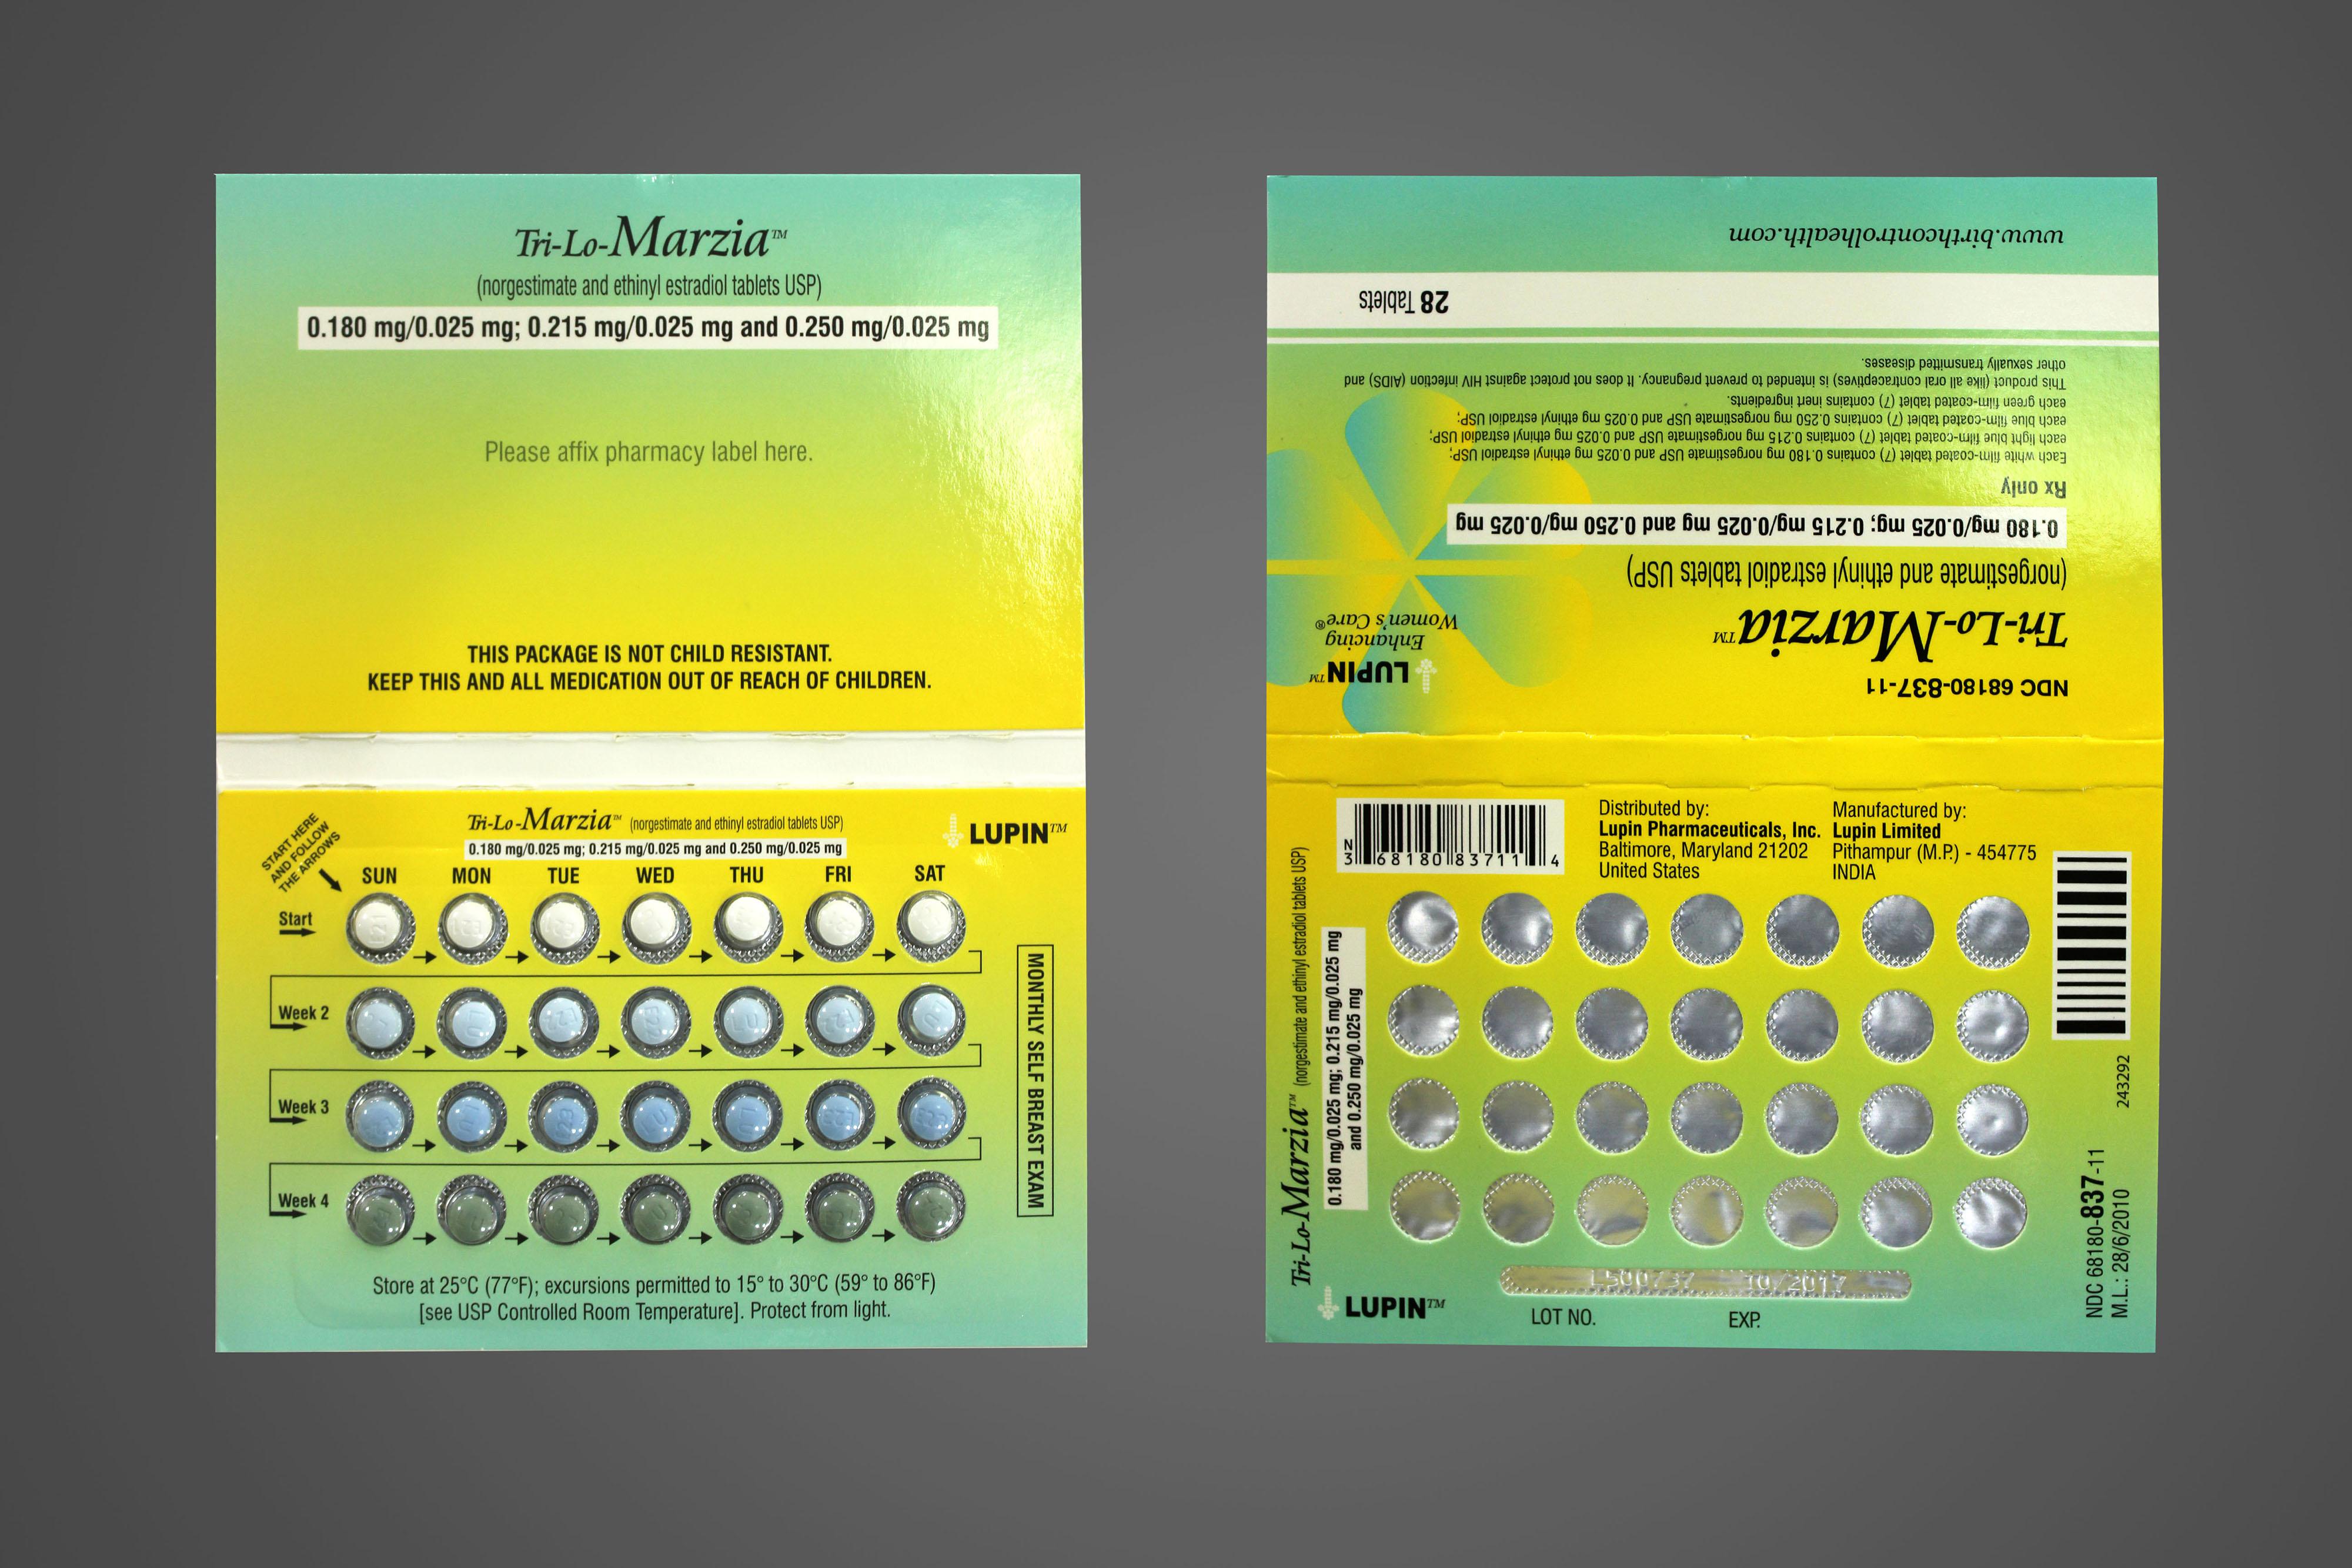 Lupin Pharmaceuticals, Inc.